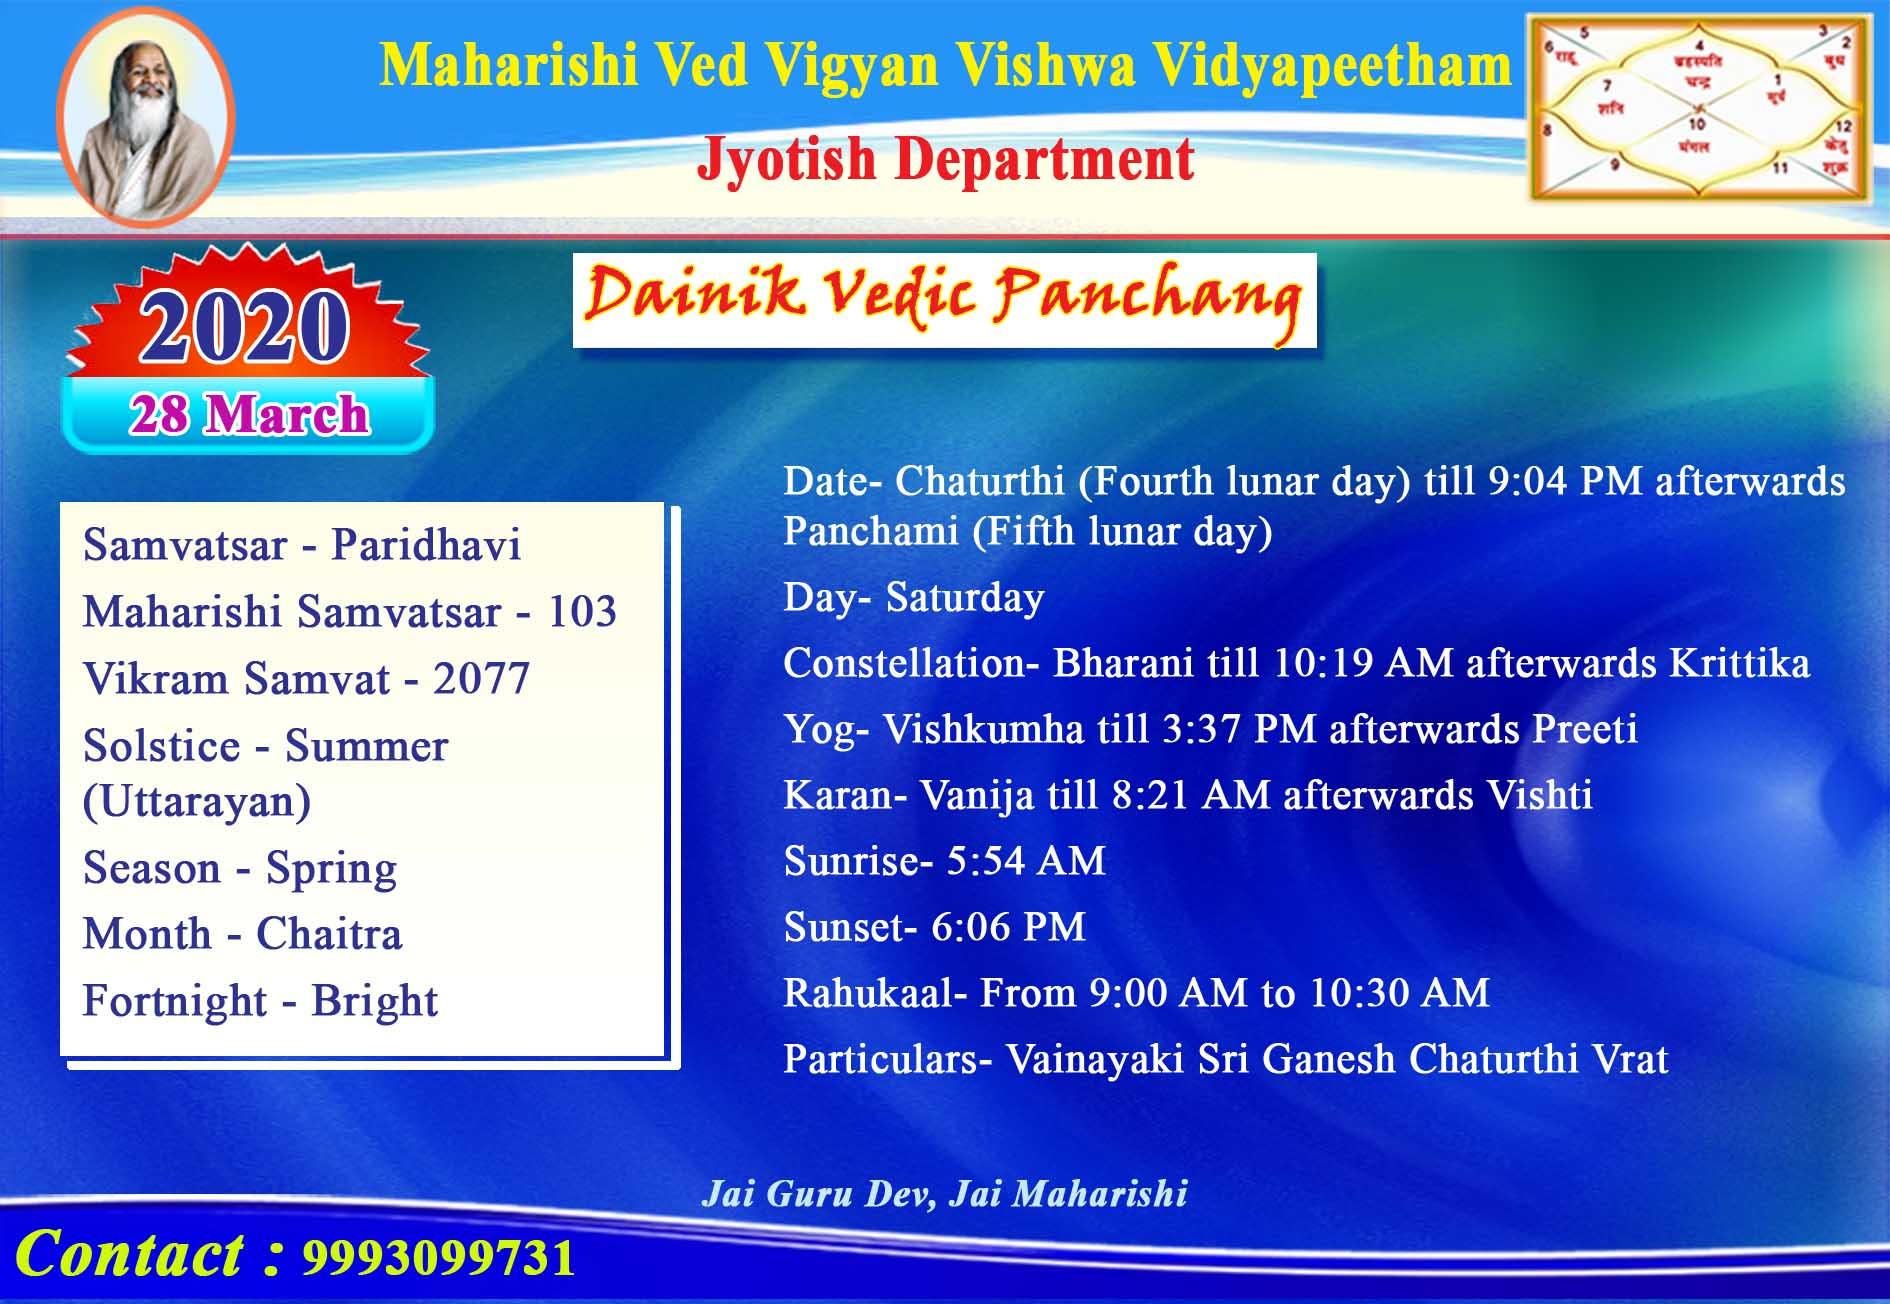 Dainik Vedic Panchang 28-March-2020